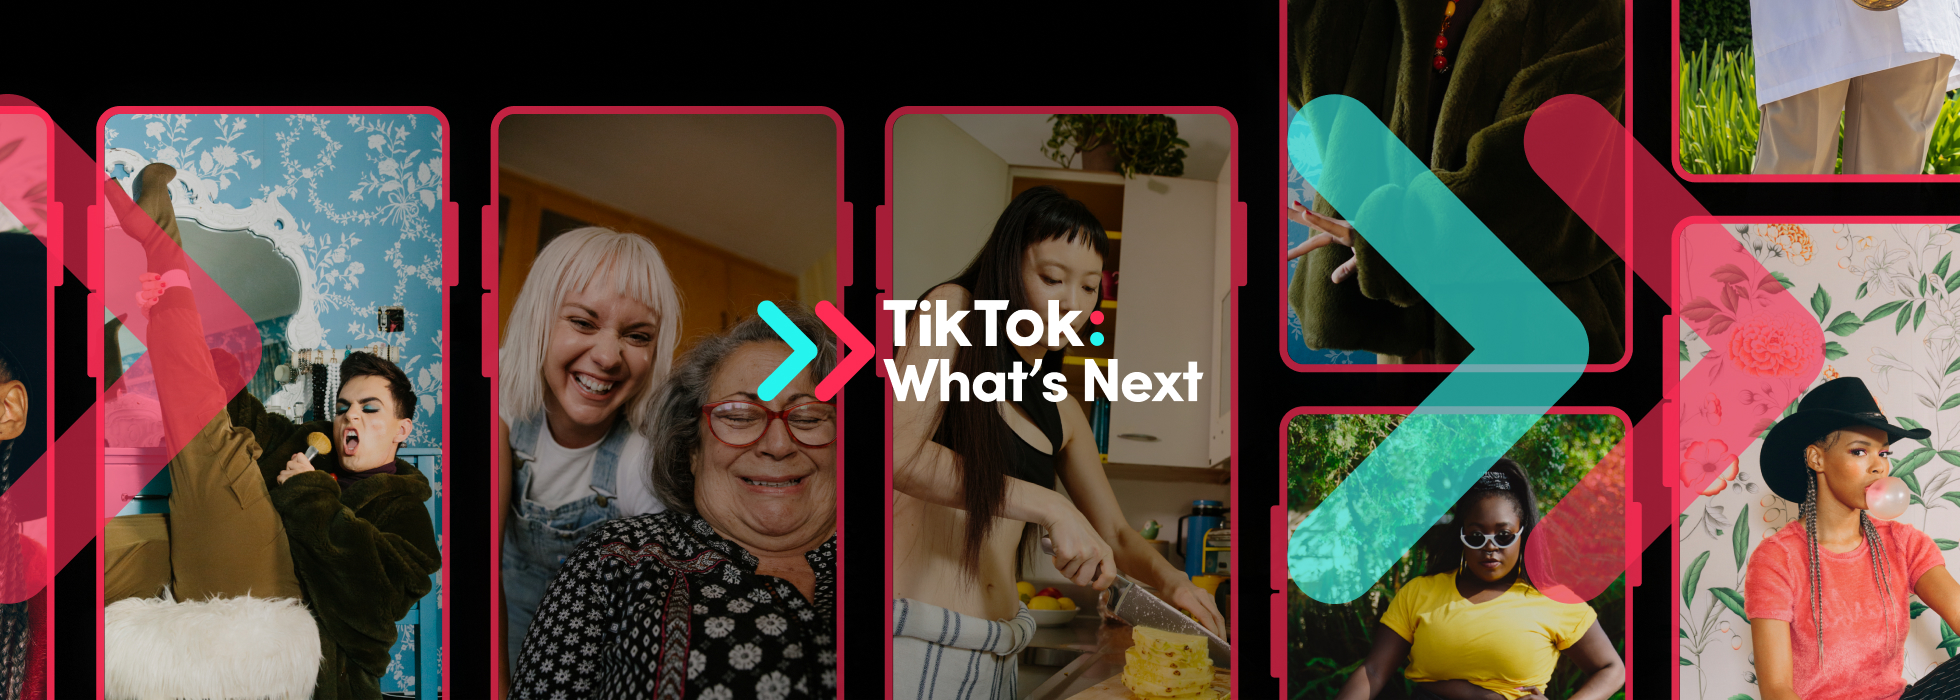 TikTok опубликовала отчет о трендовом контенте в 19 странах